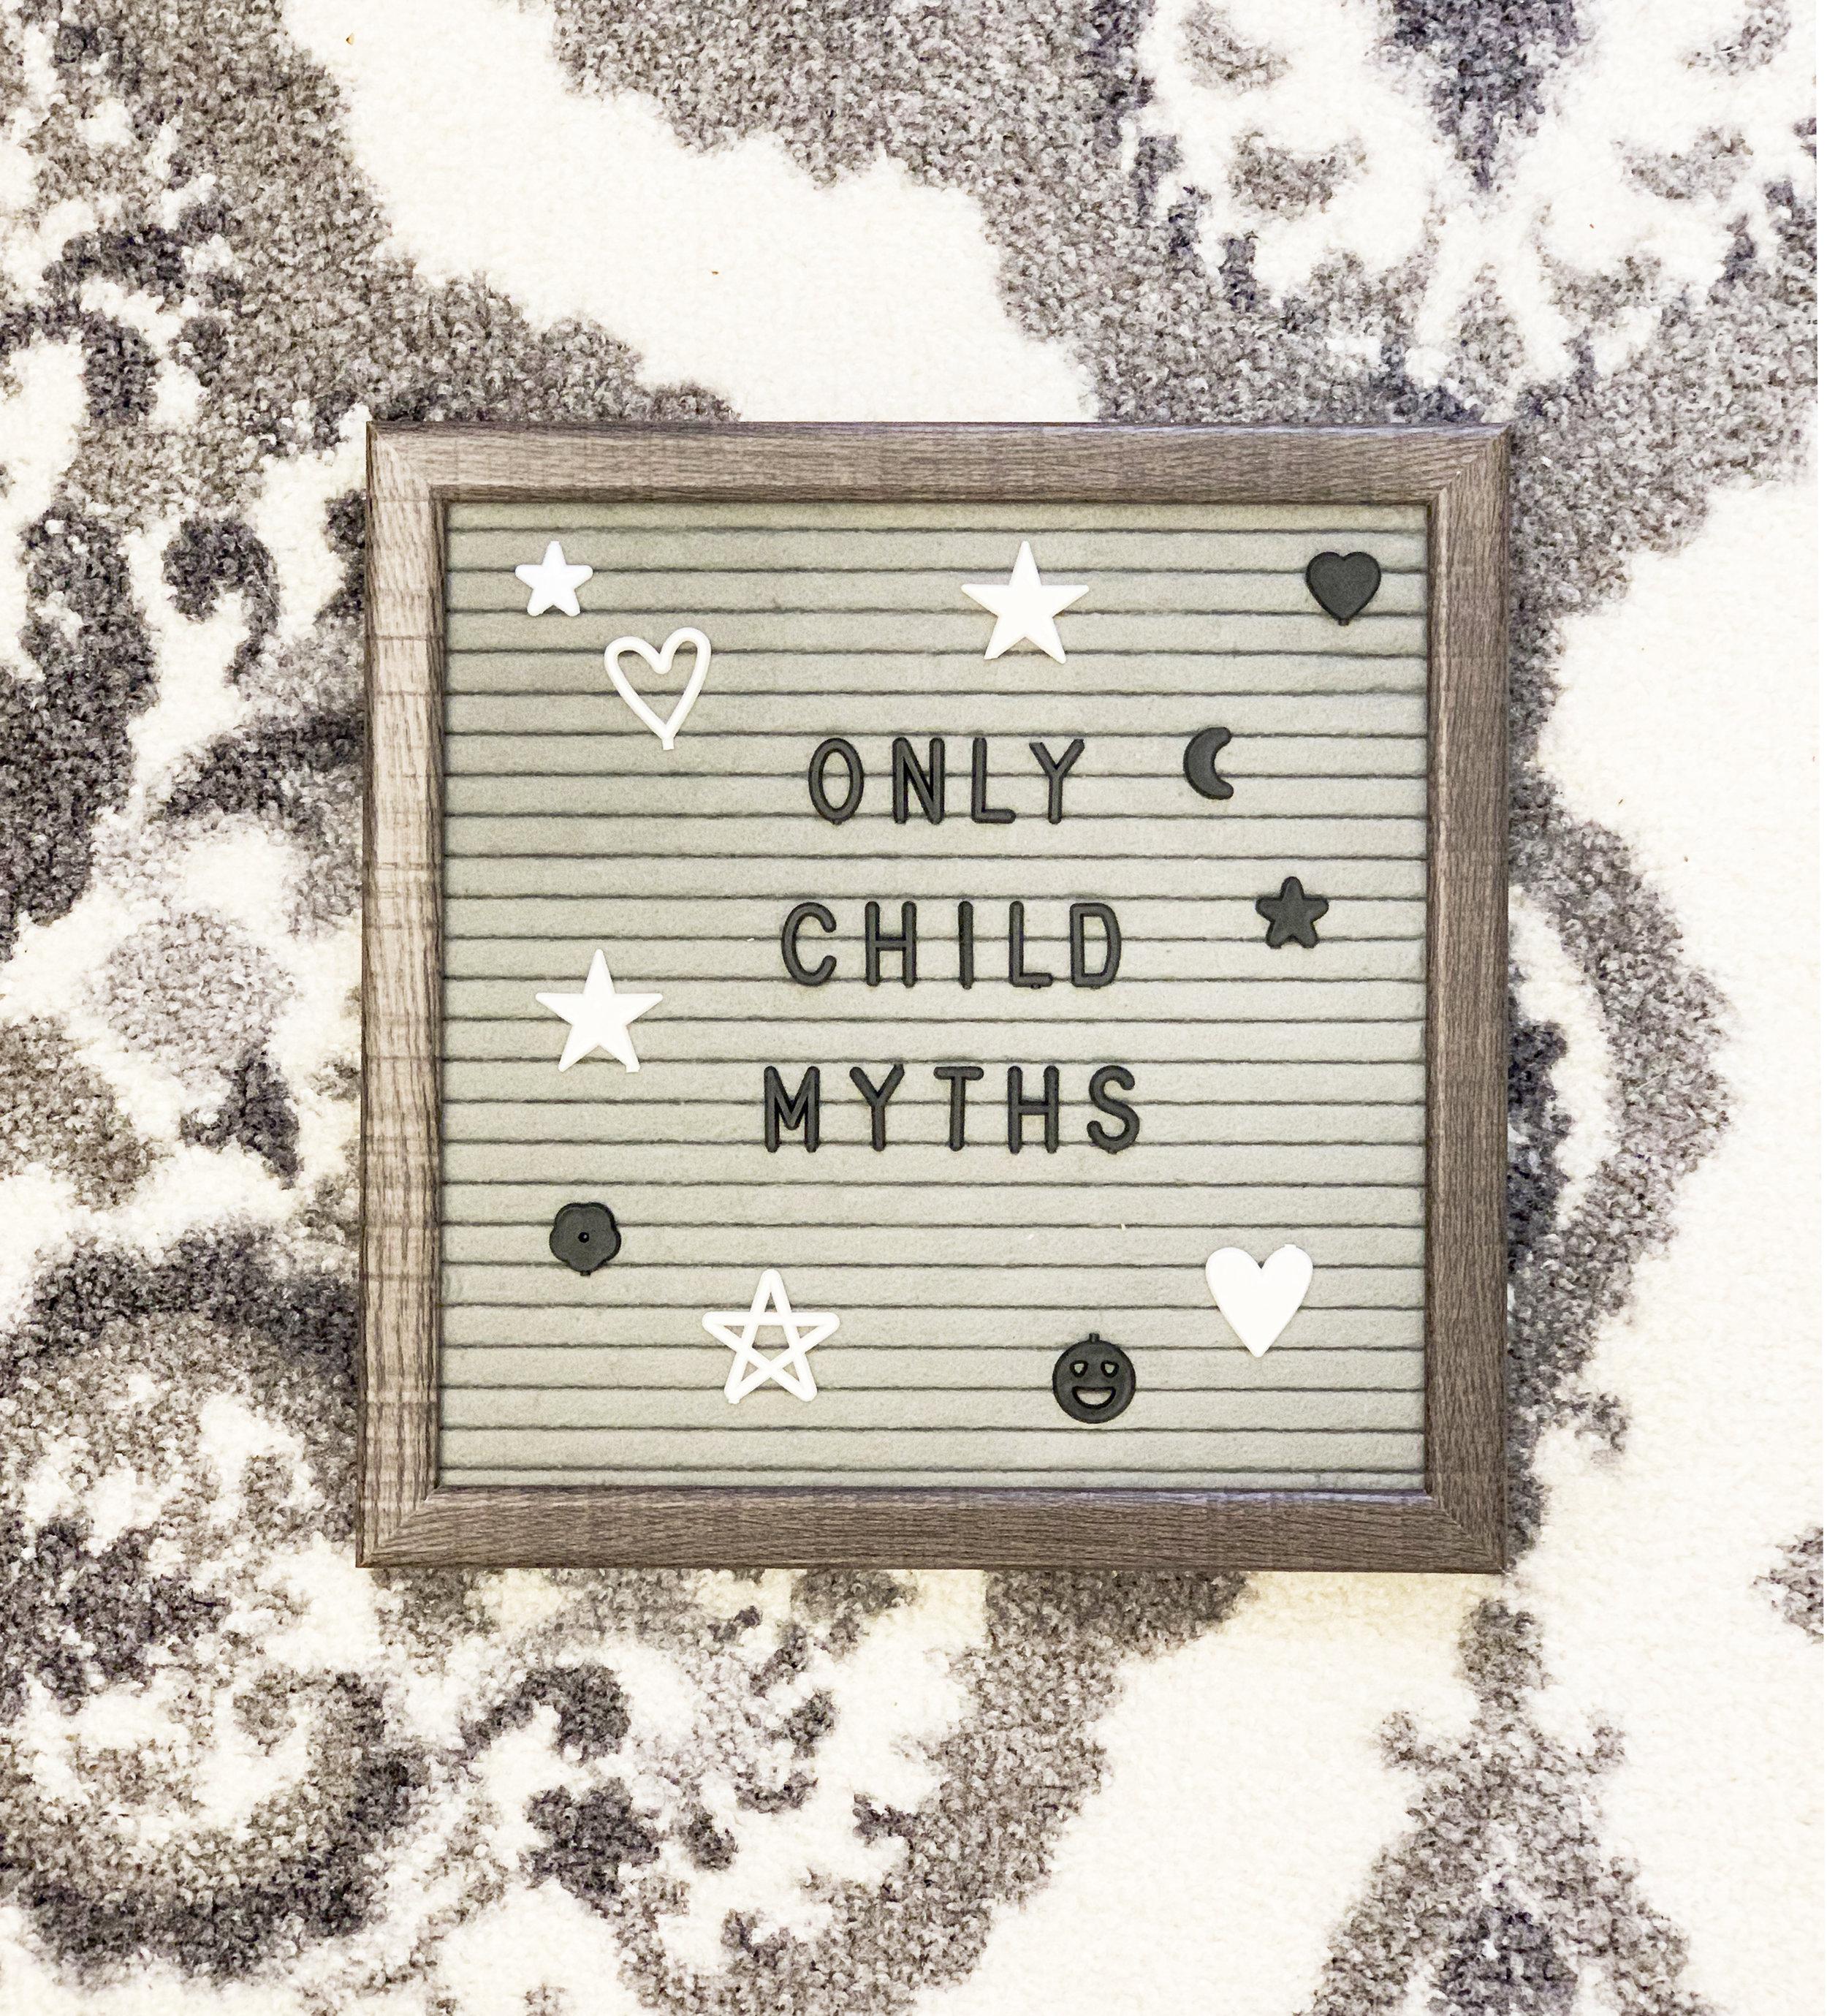 5.30.19 - Only Child Myths.JPG